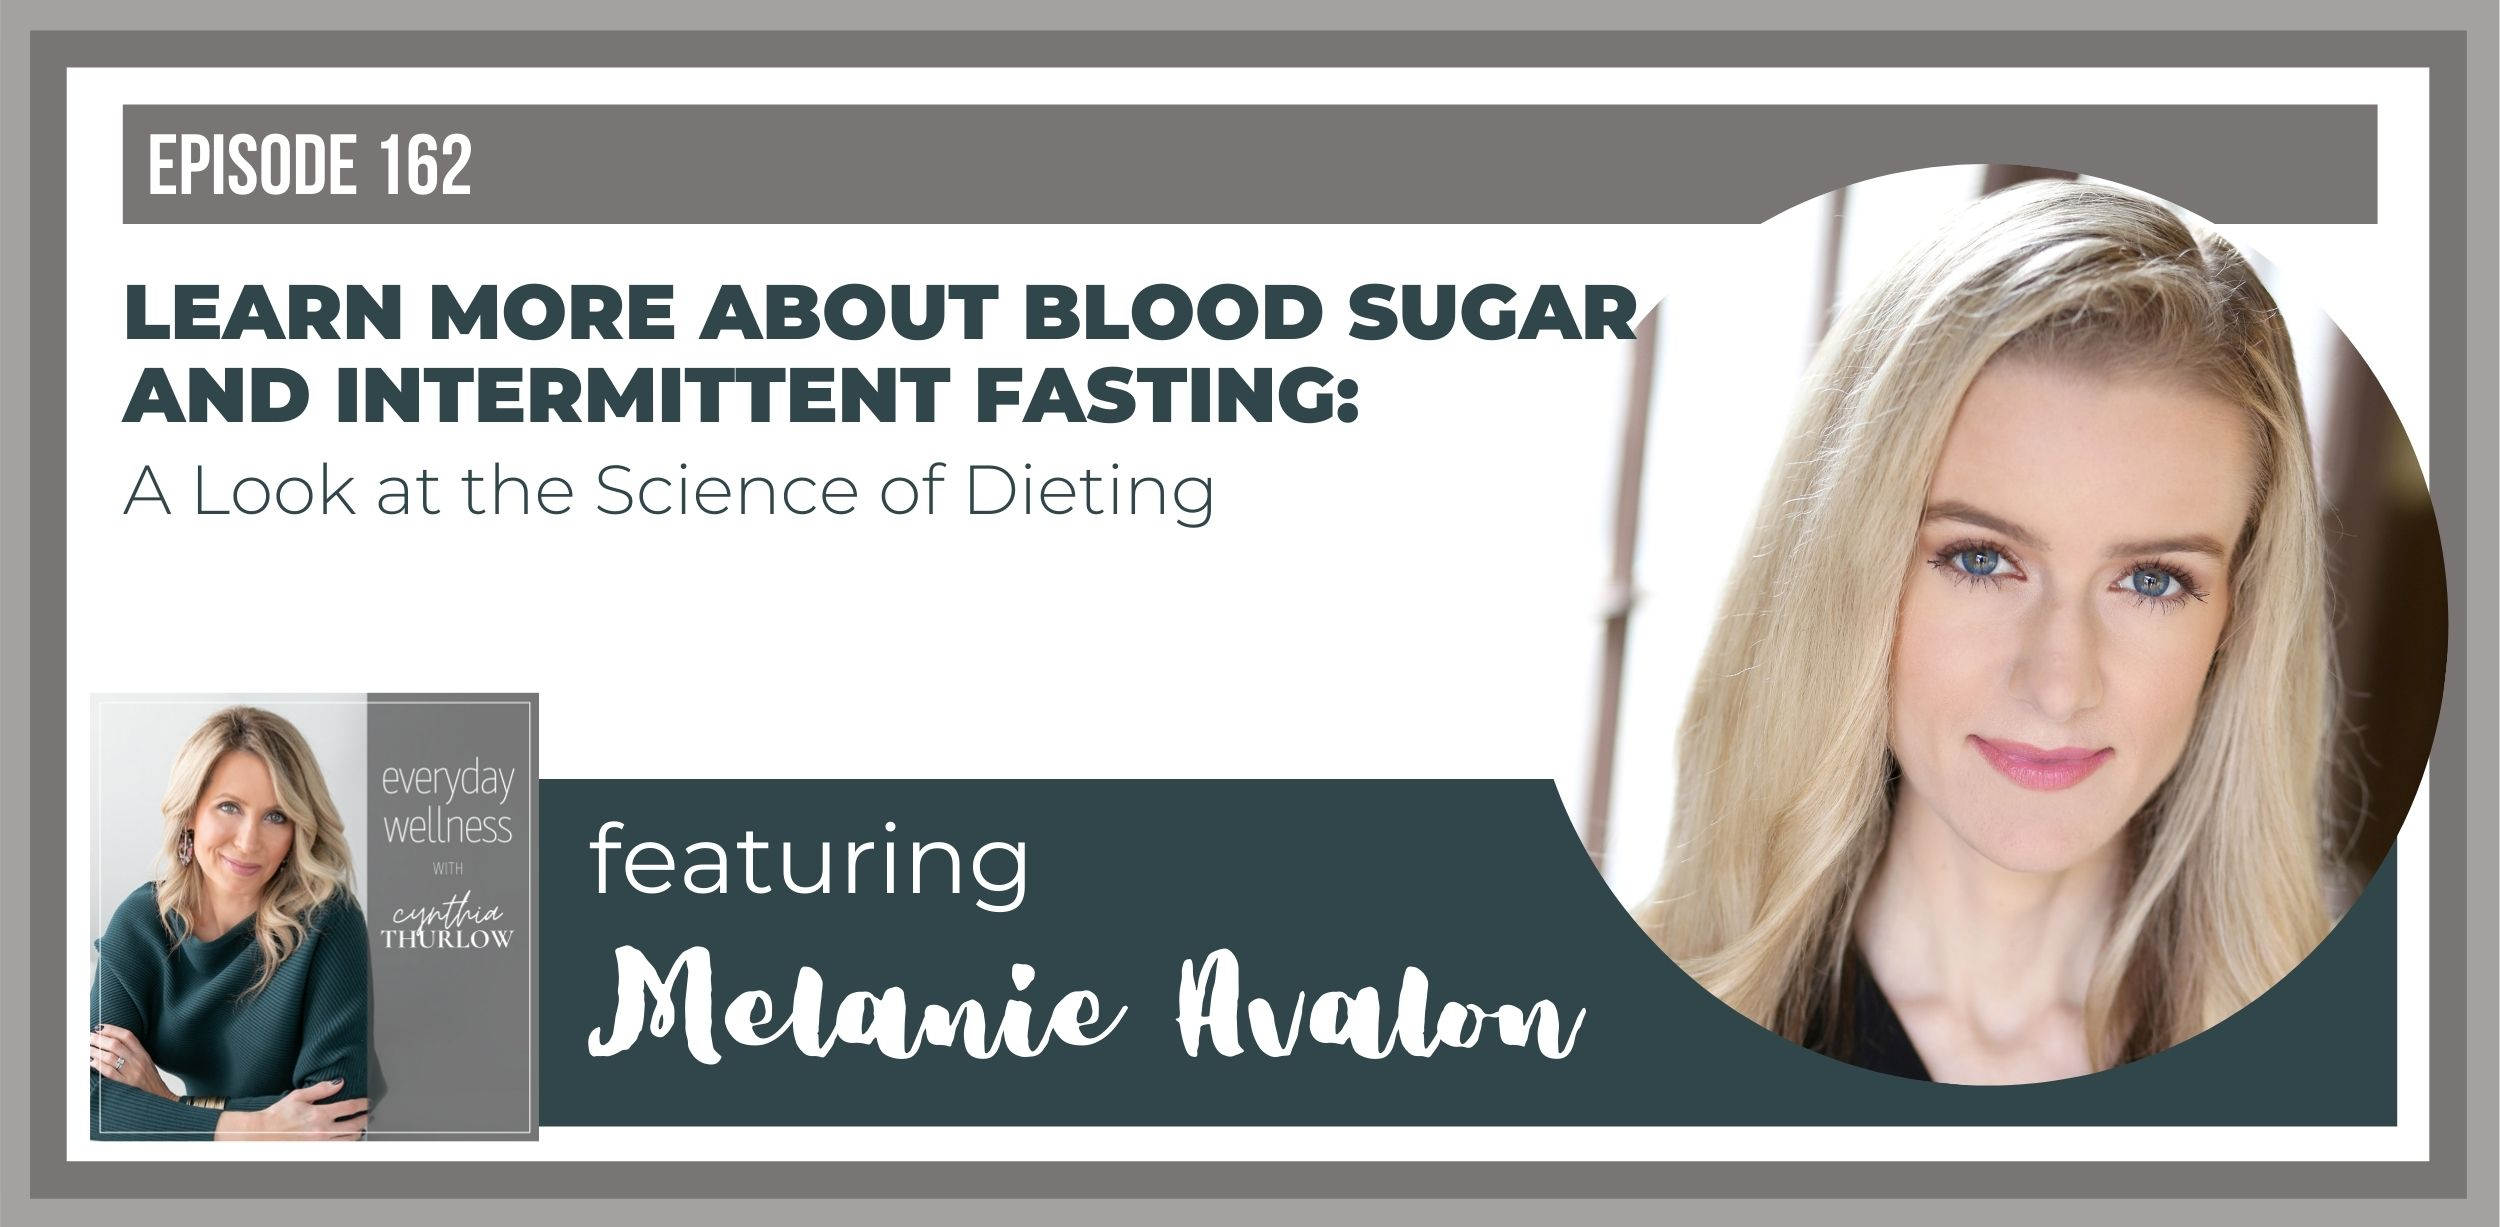 Melanie Avalon on The Everyday Wellness Podcast with Cynthia Thurlow